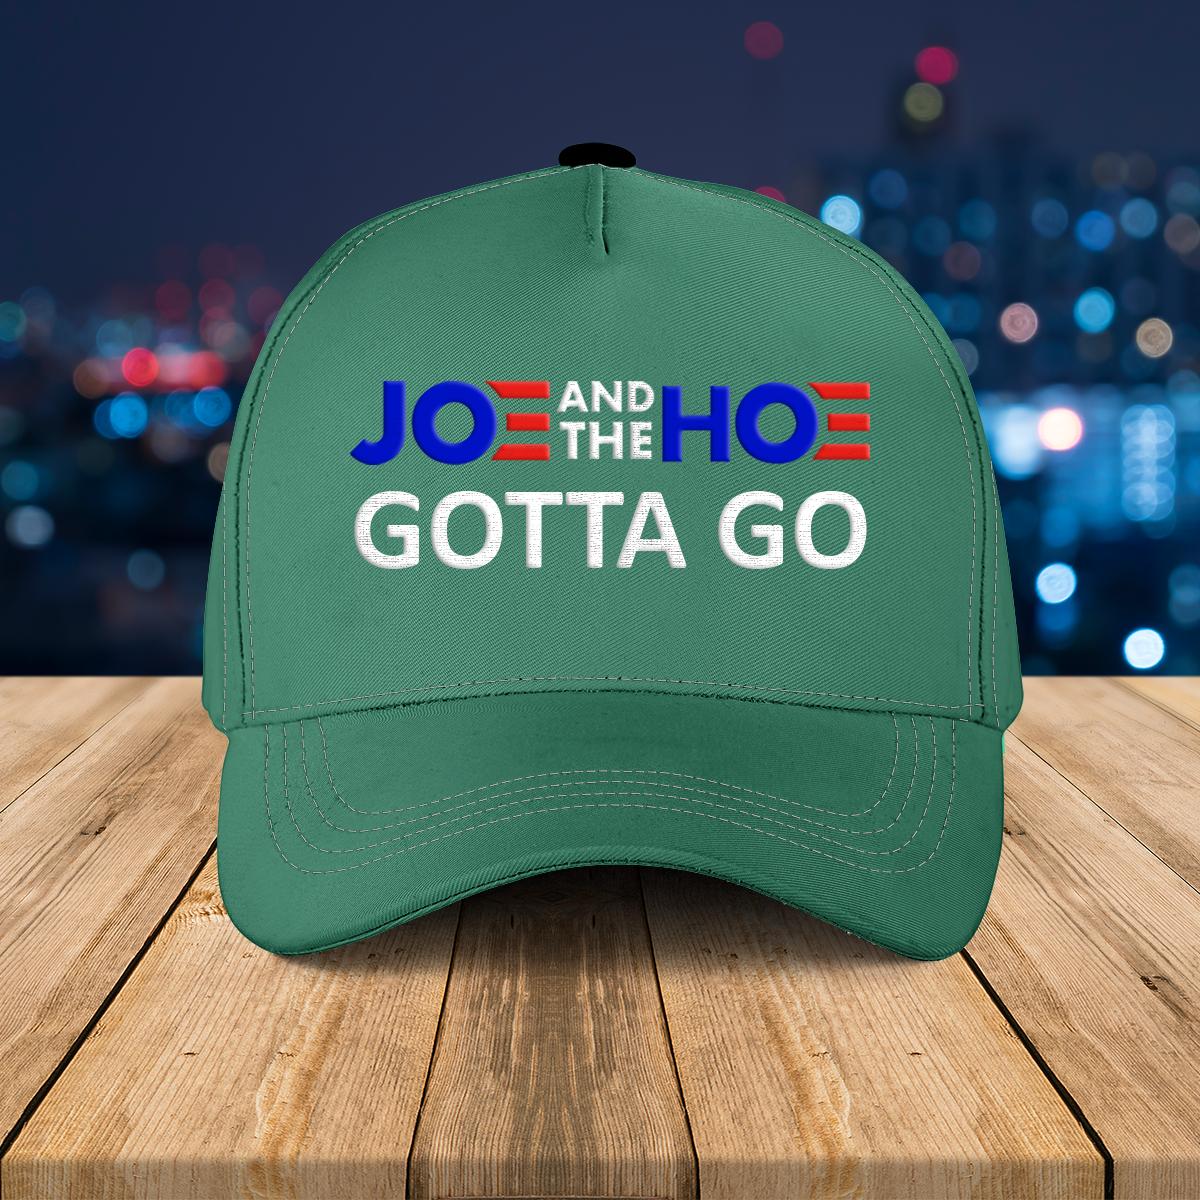 Joe and the Hoe gotta go cap1